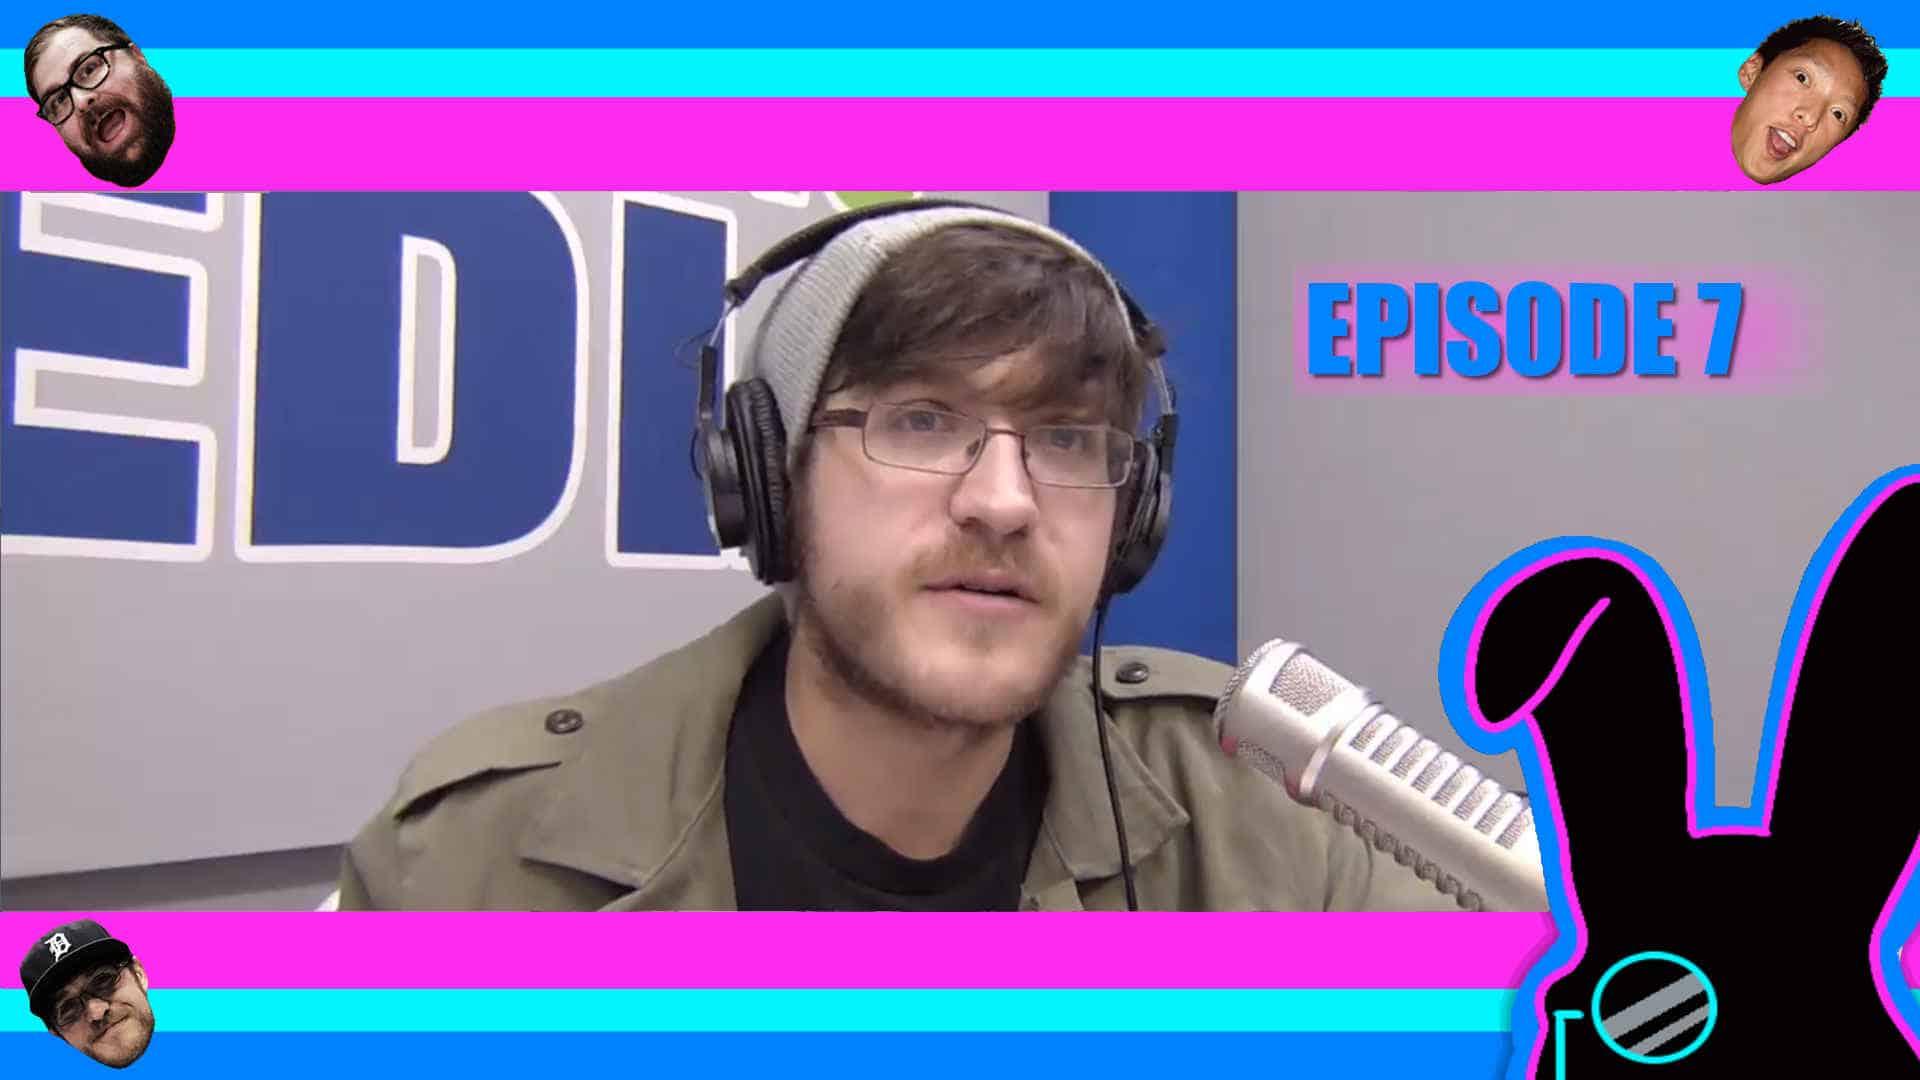 Geektainment Weekly - Episode 7